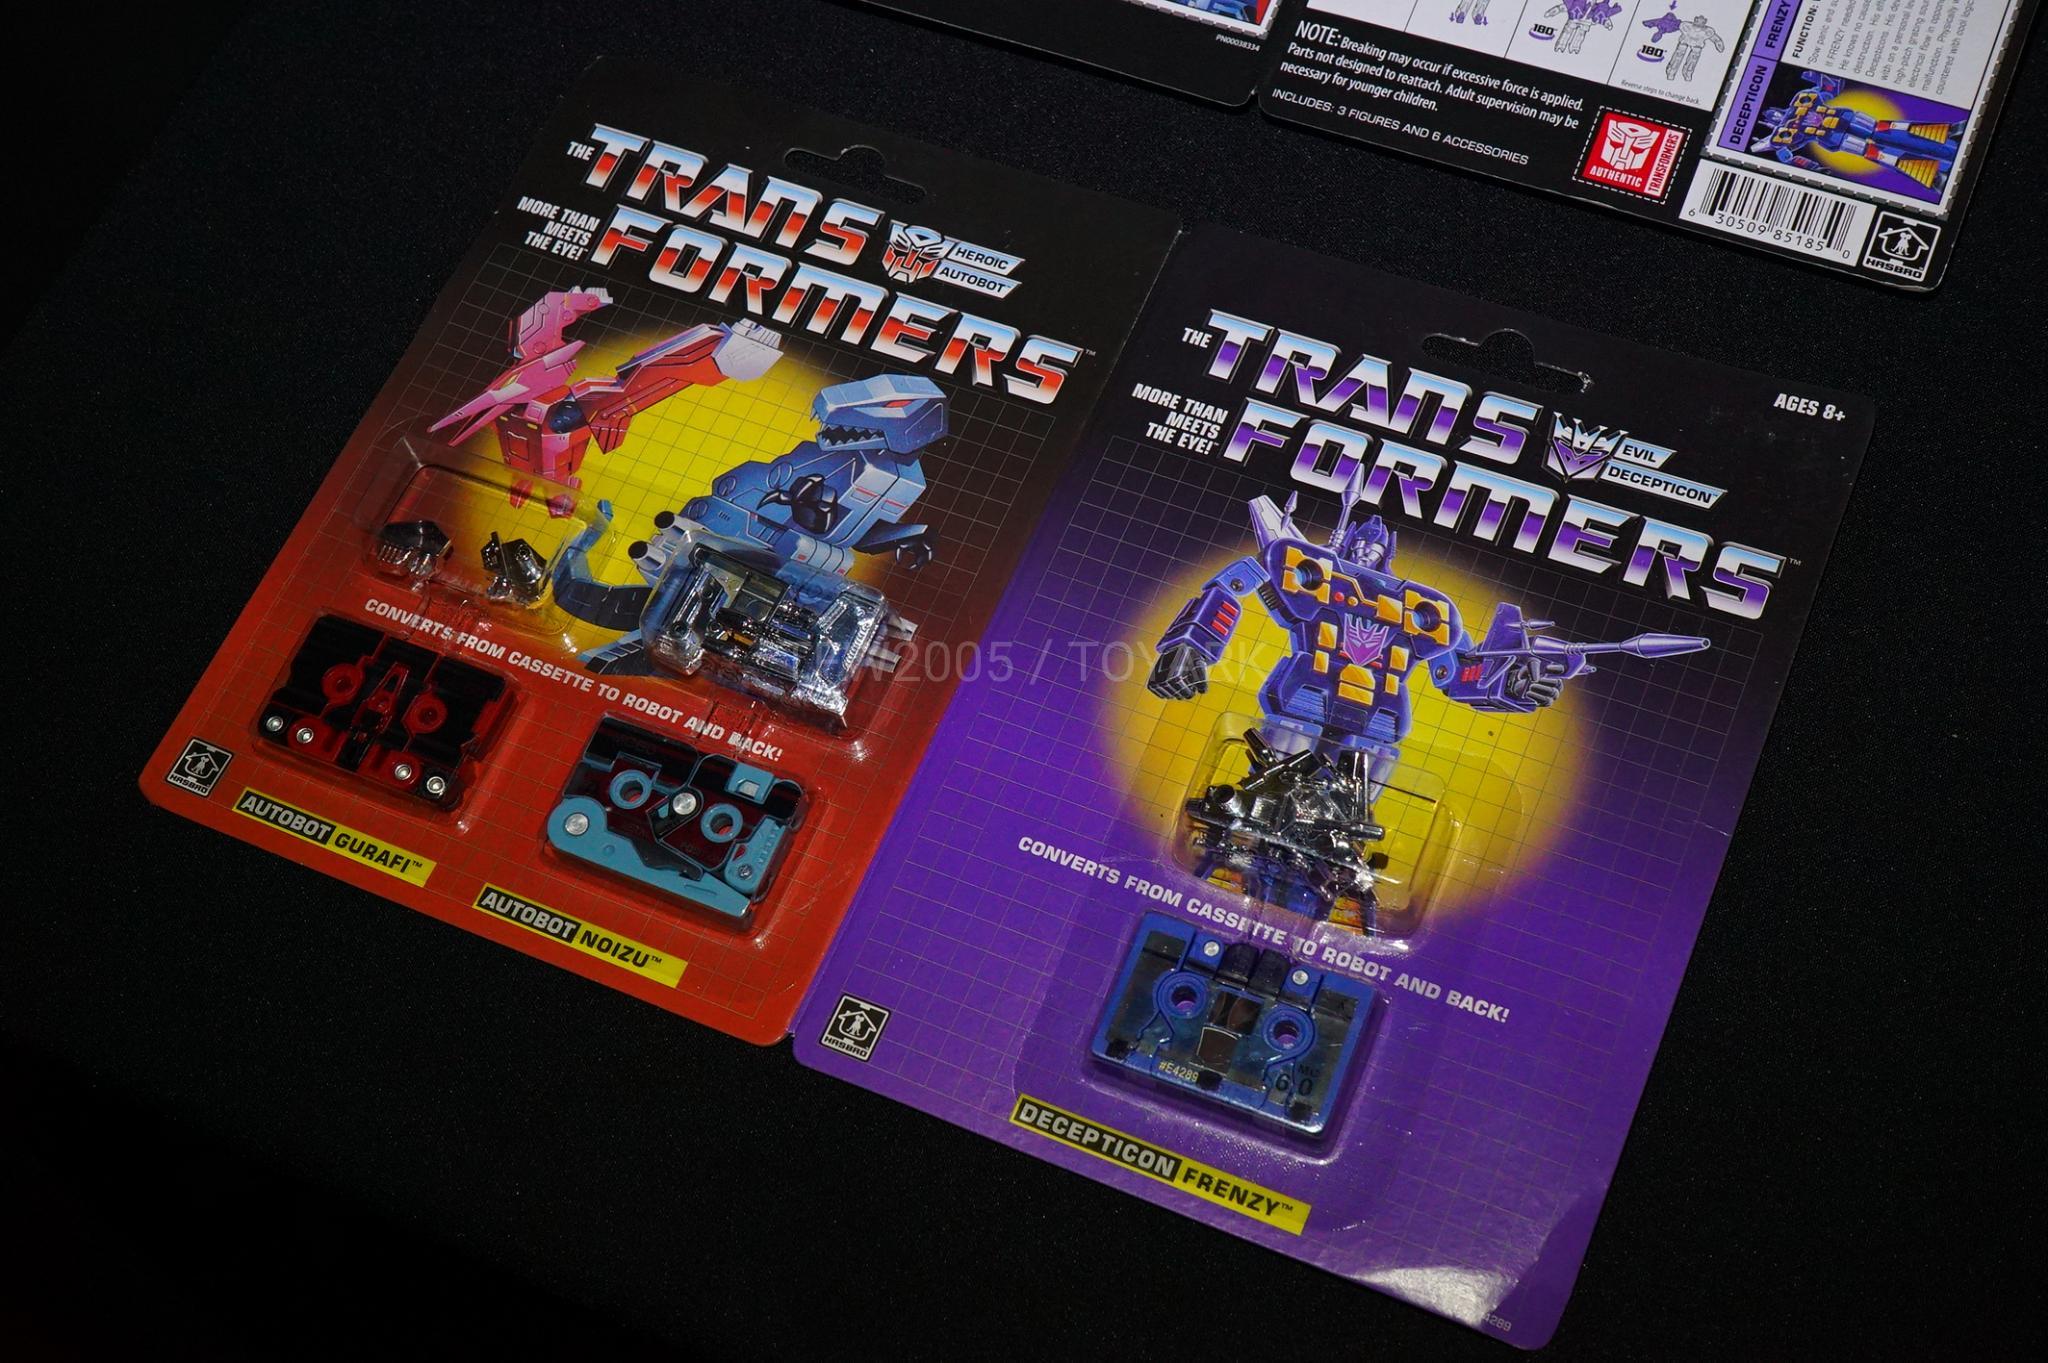 New transformers Vintage G1 Mini-Cassettes 3 Pack Gurafi+Noizu+Decepticon Frenzy